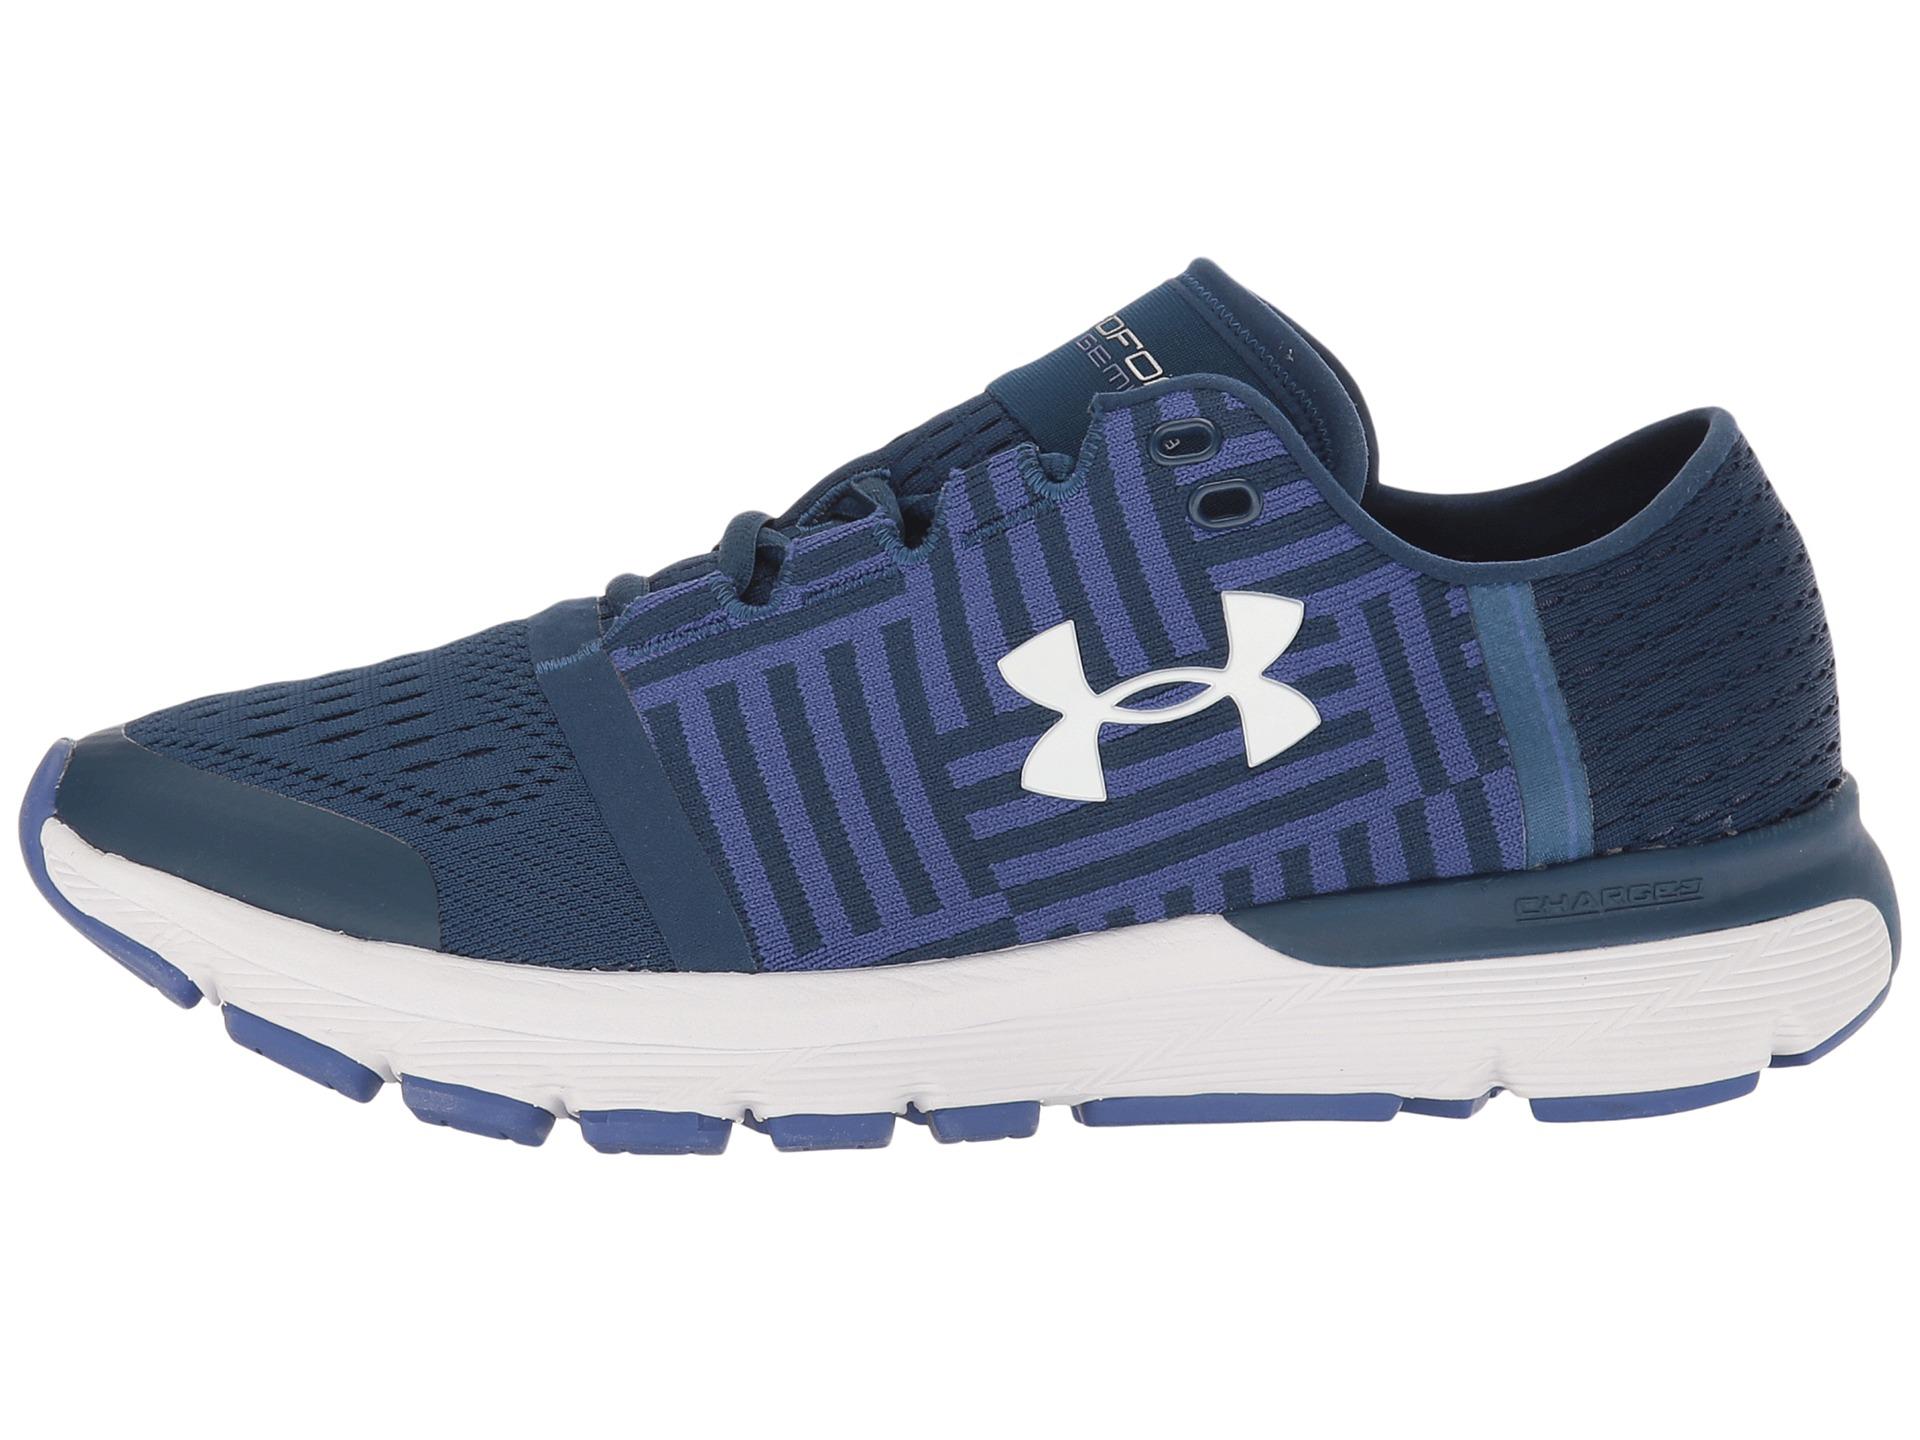 Speedform Gemini  Re Running Shoes Email